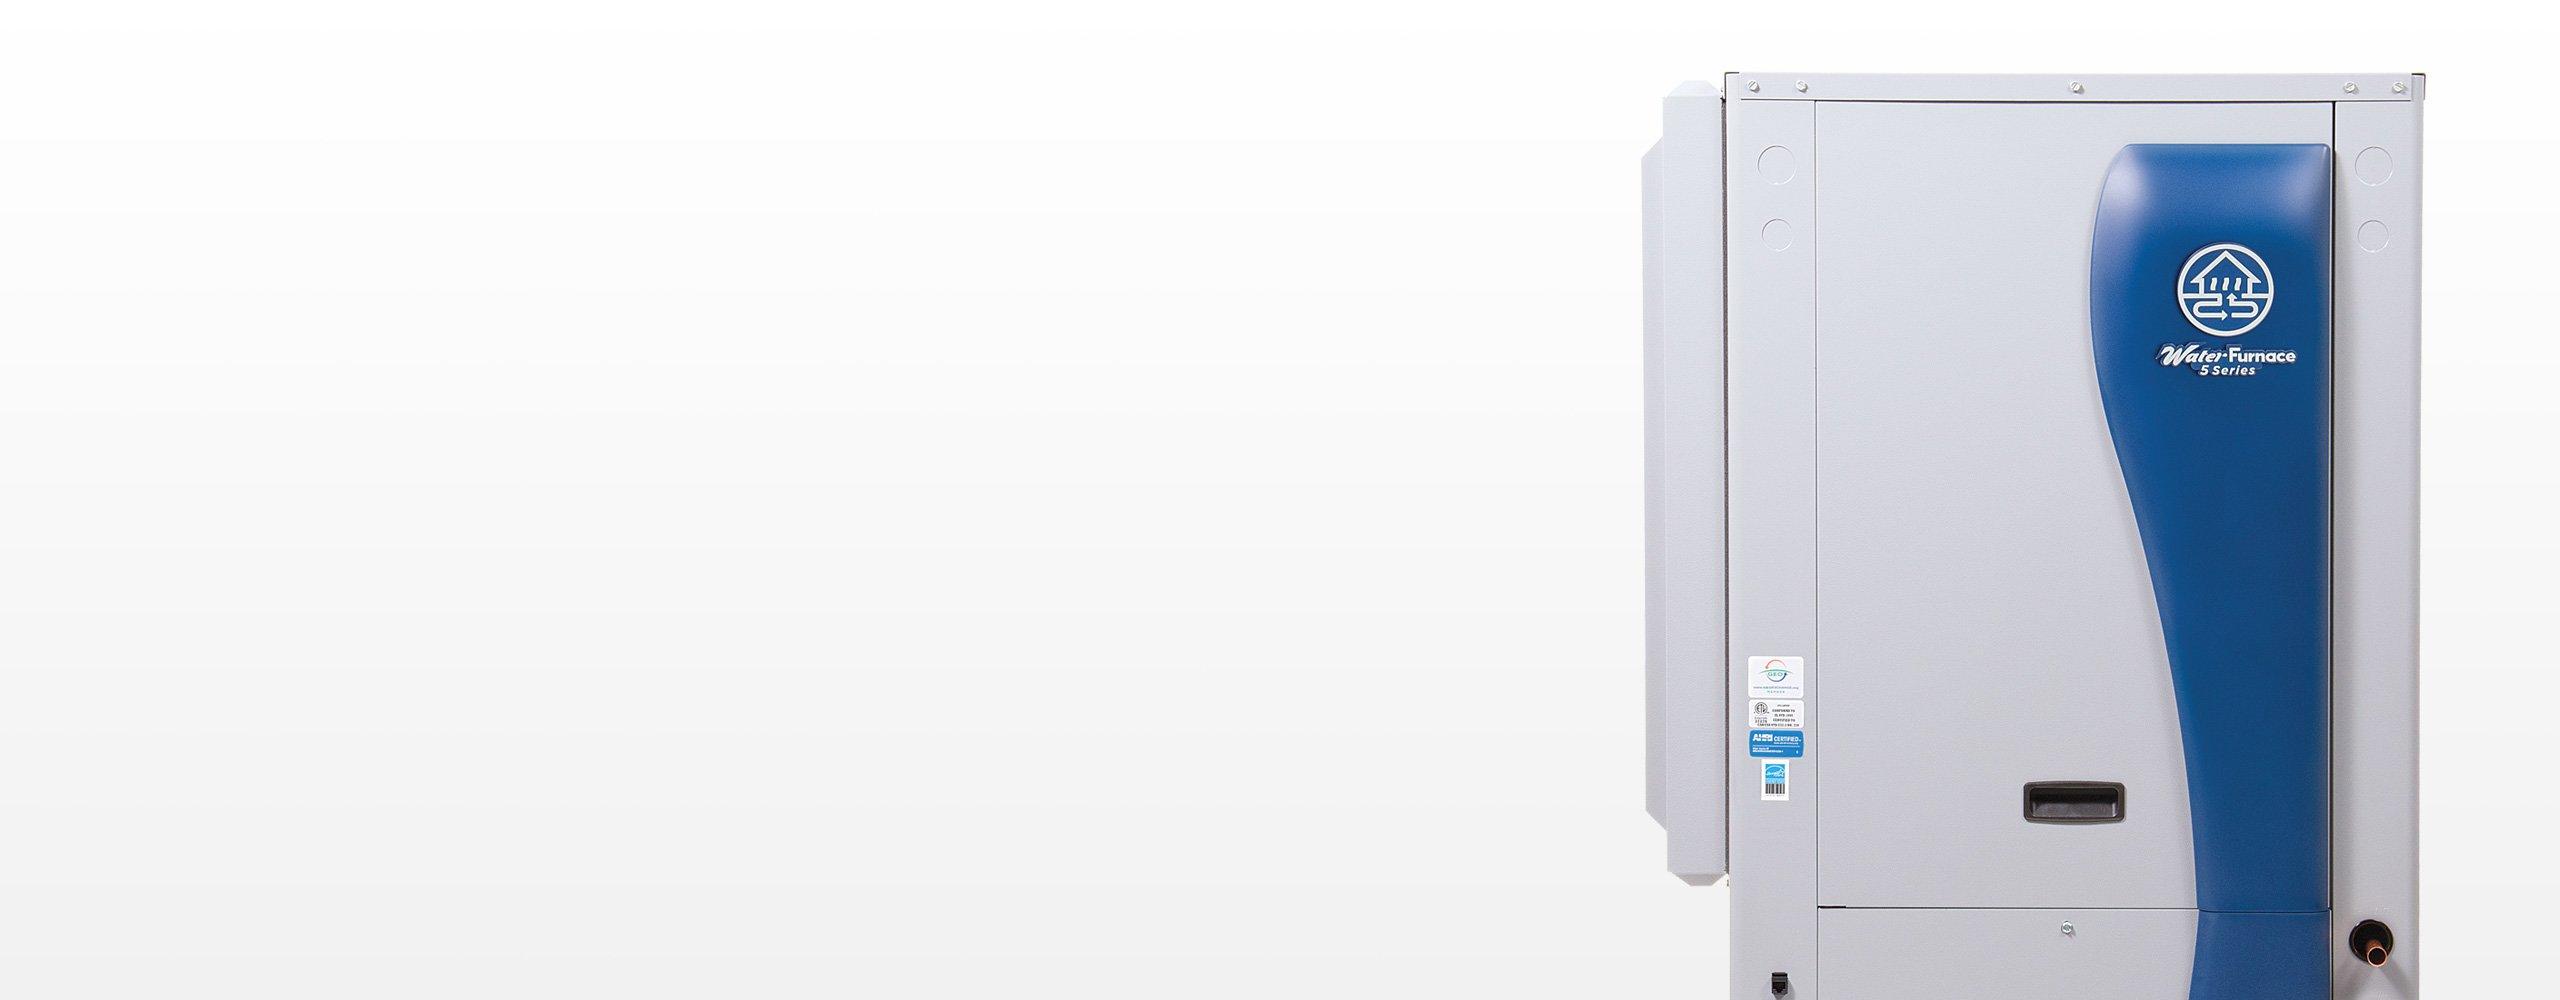 heil wiring diagram heat pump kymco agility city 50 icp thermostat